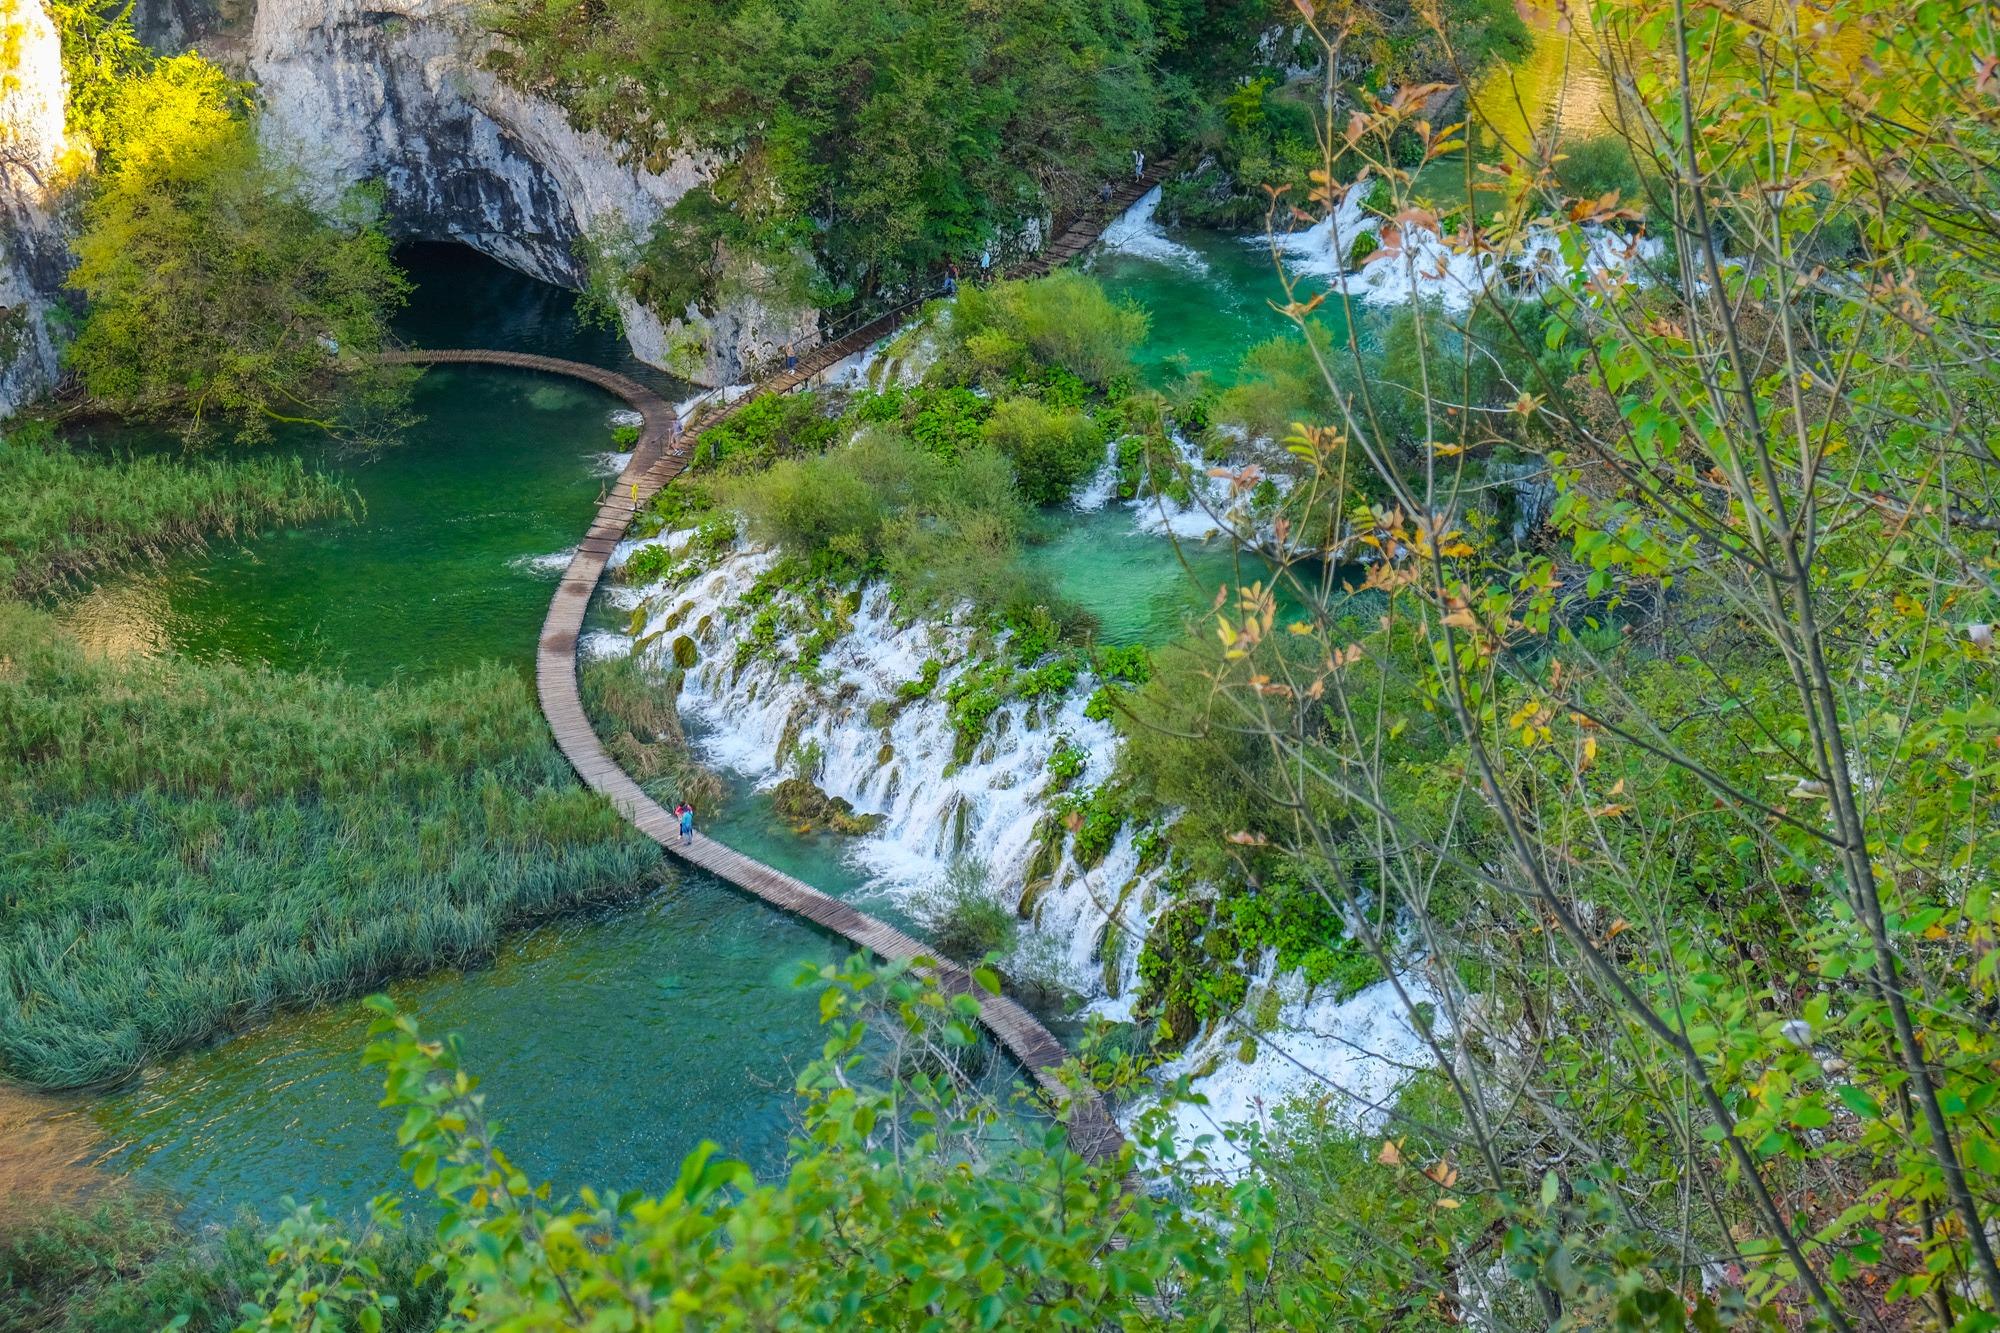 Plitvice Lakes National